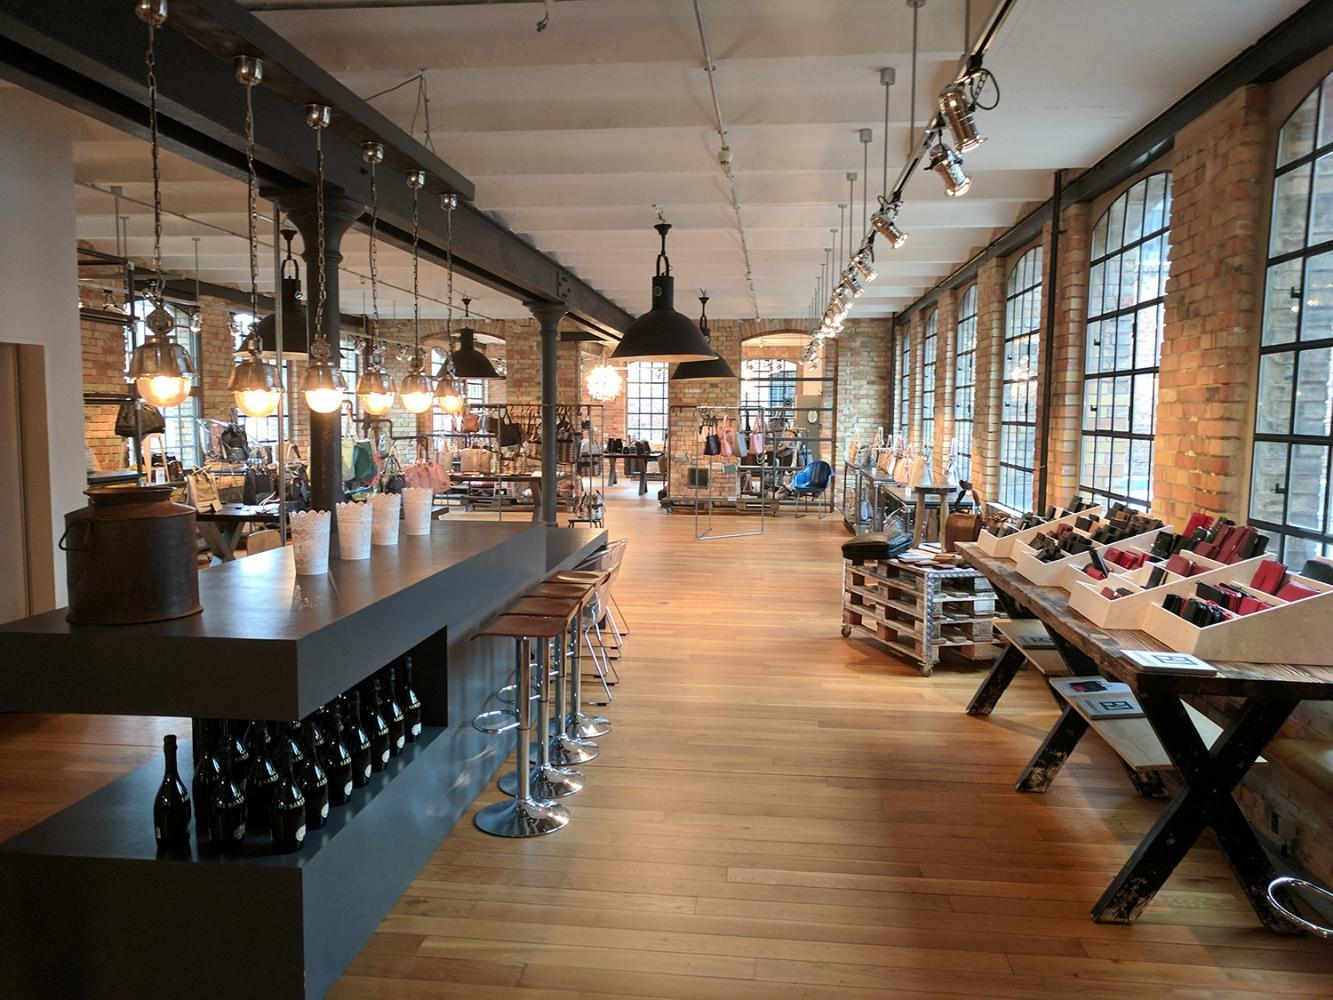 Orderdays at Showroom Heynefabrik - Bodenschatz Fashion GmbH